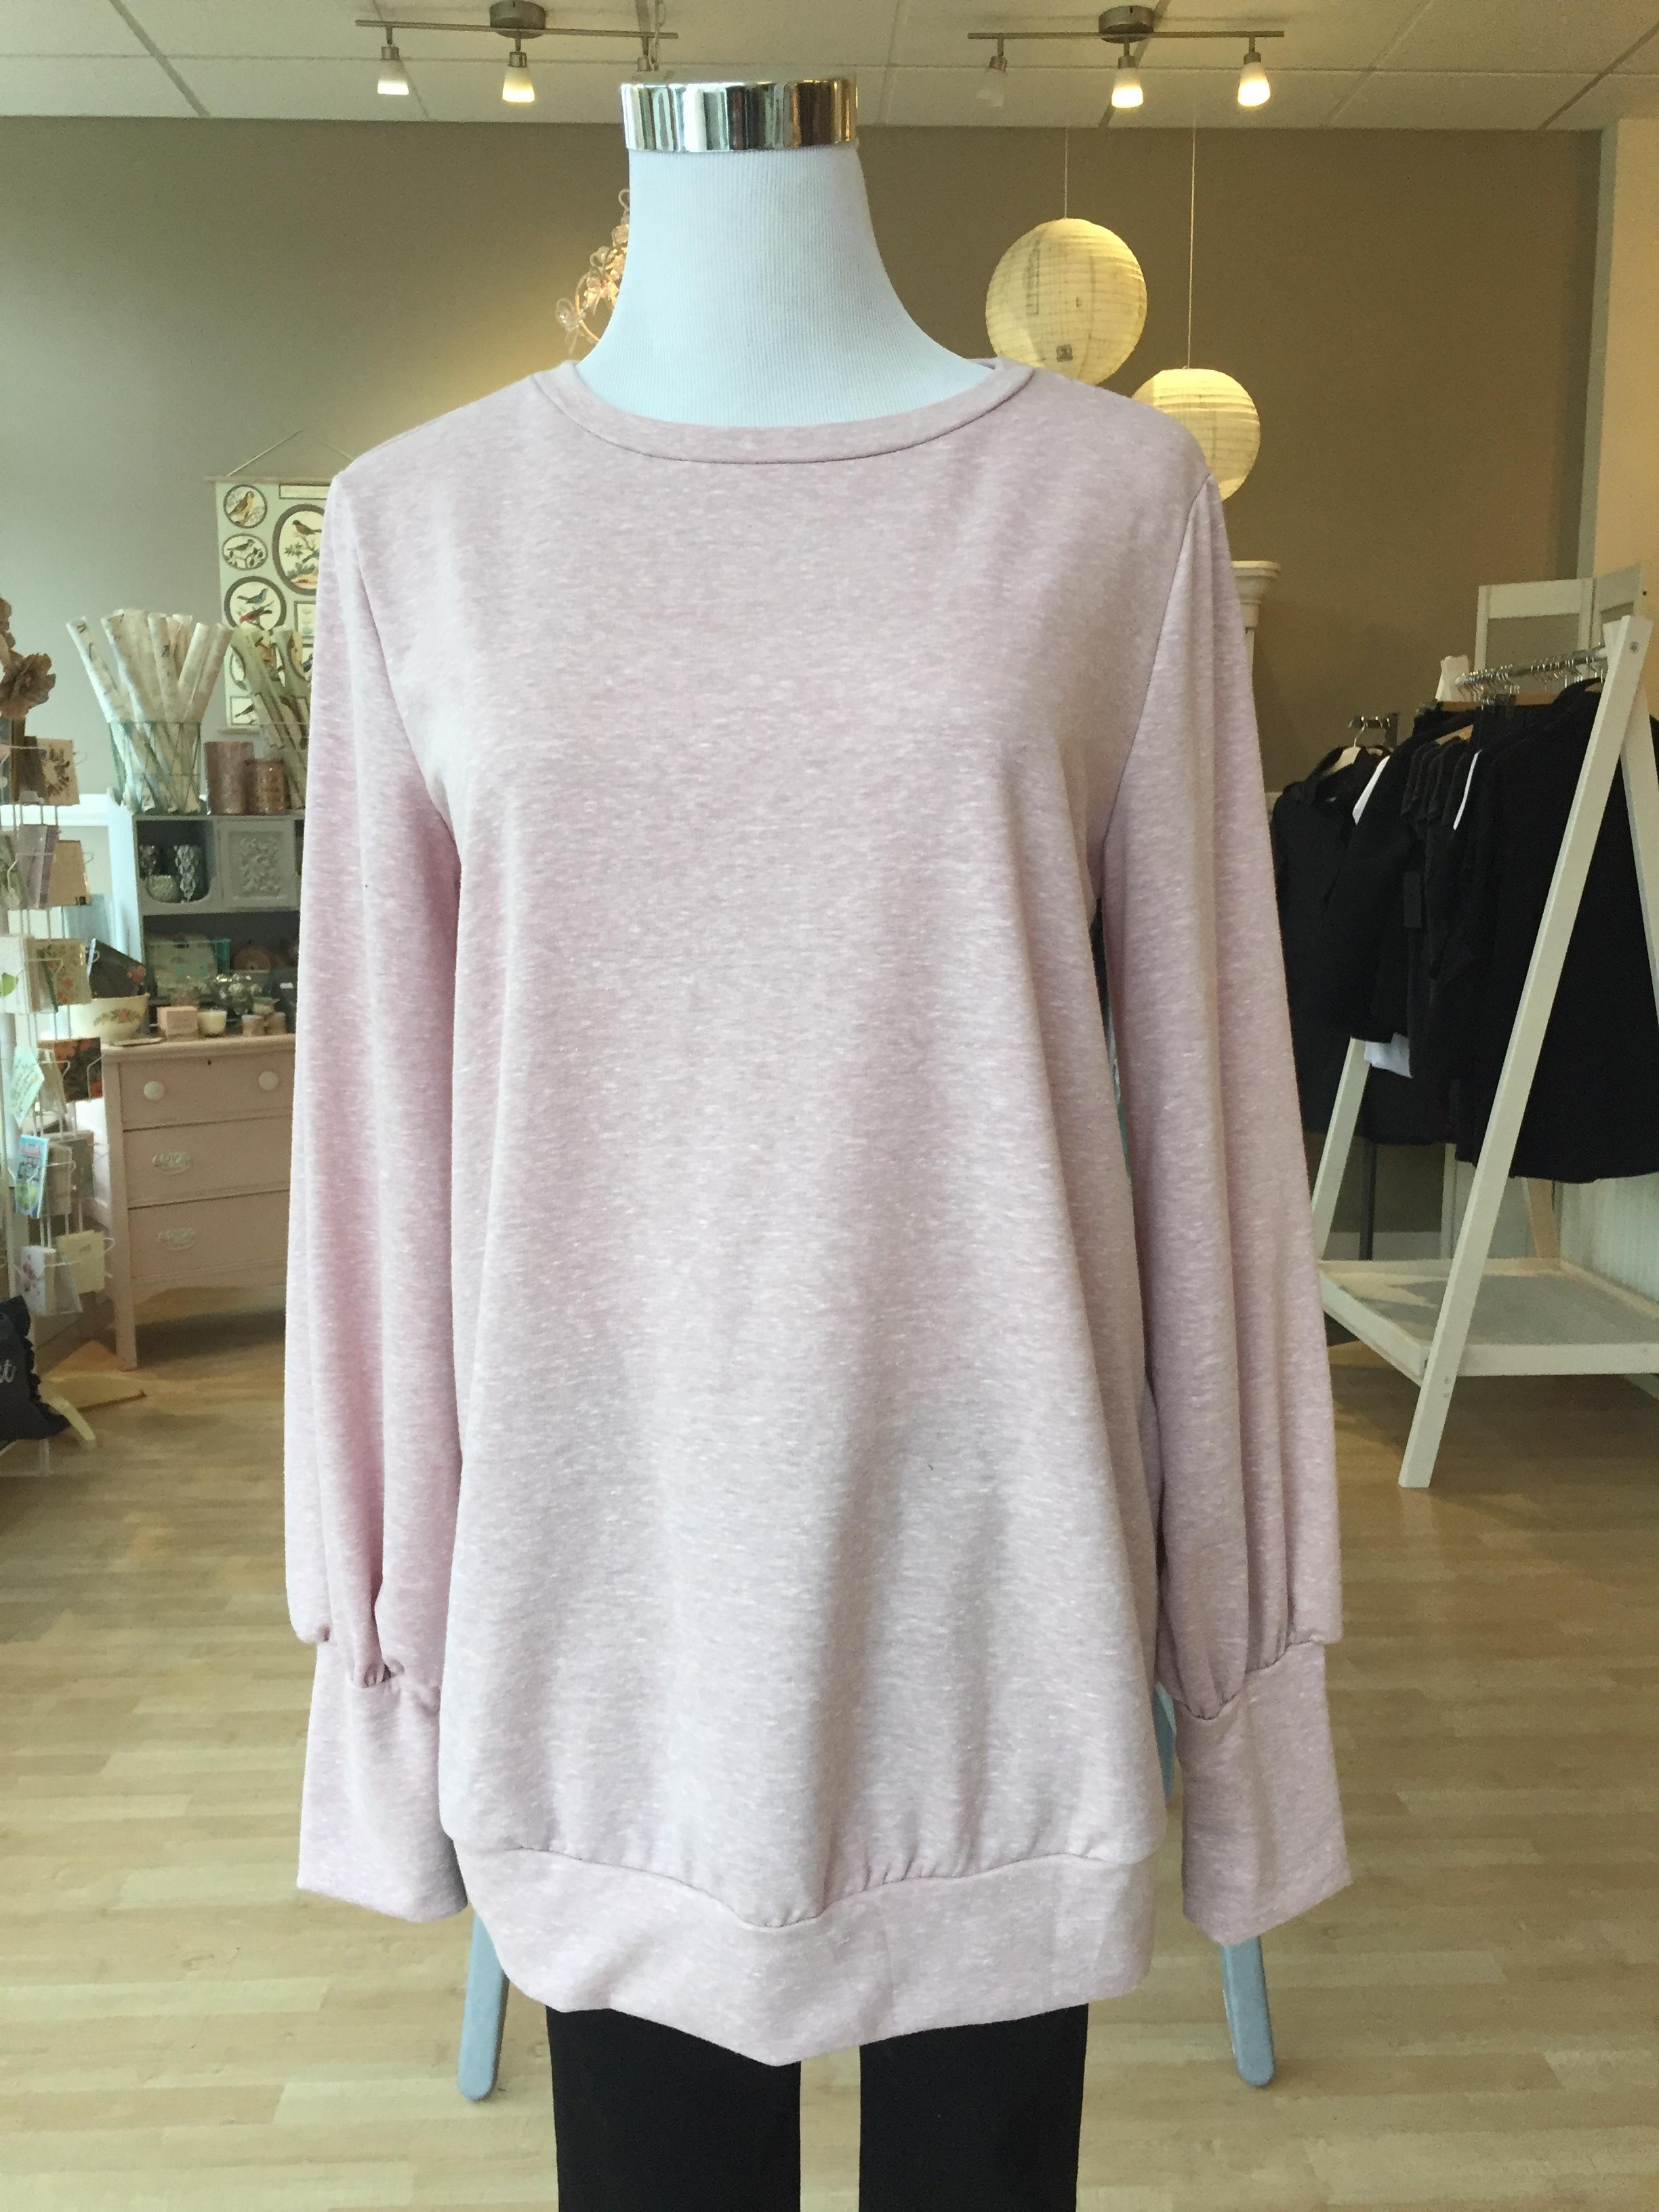 Top w/ Cute Sleeves $38 (pink, charcoal)